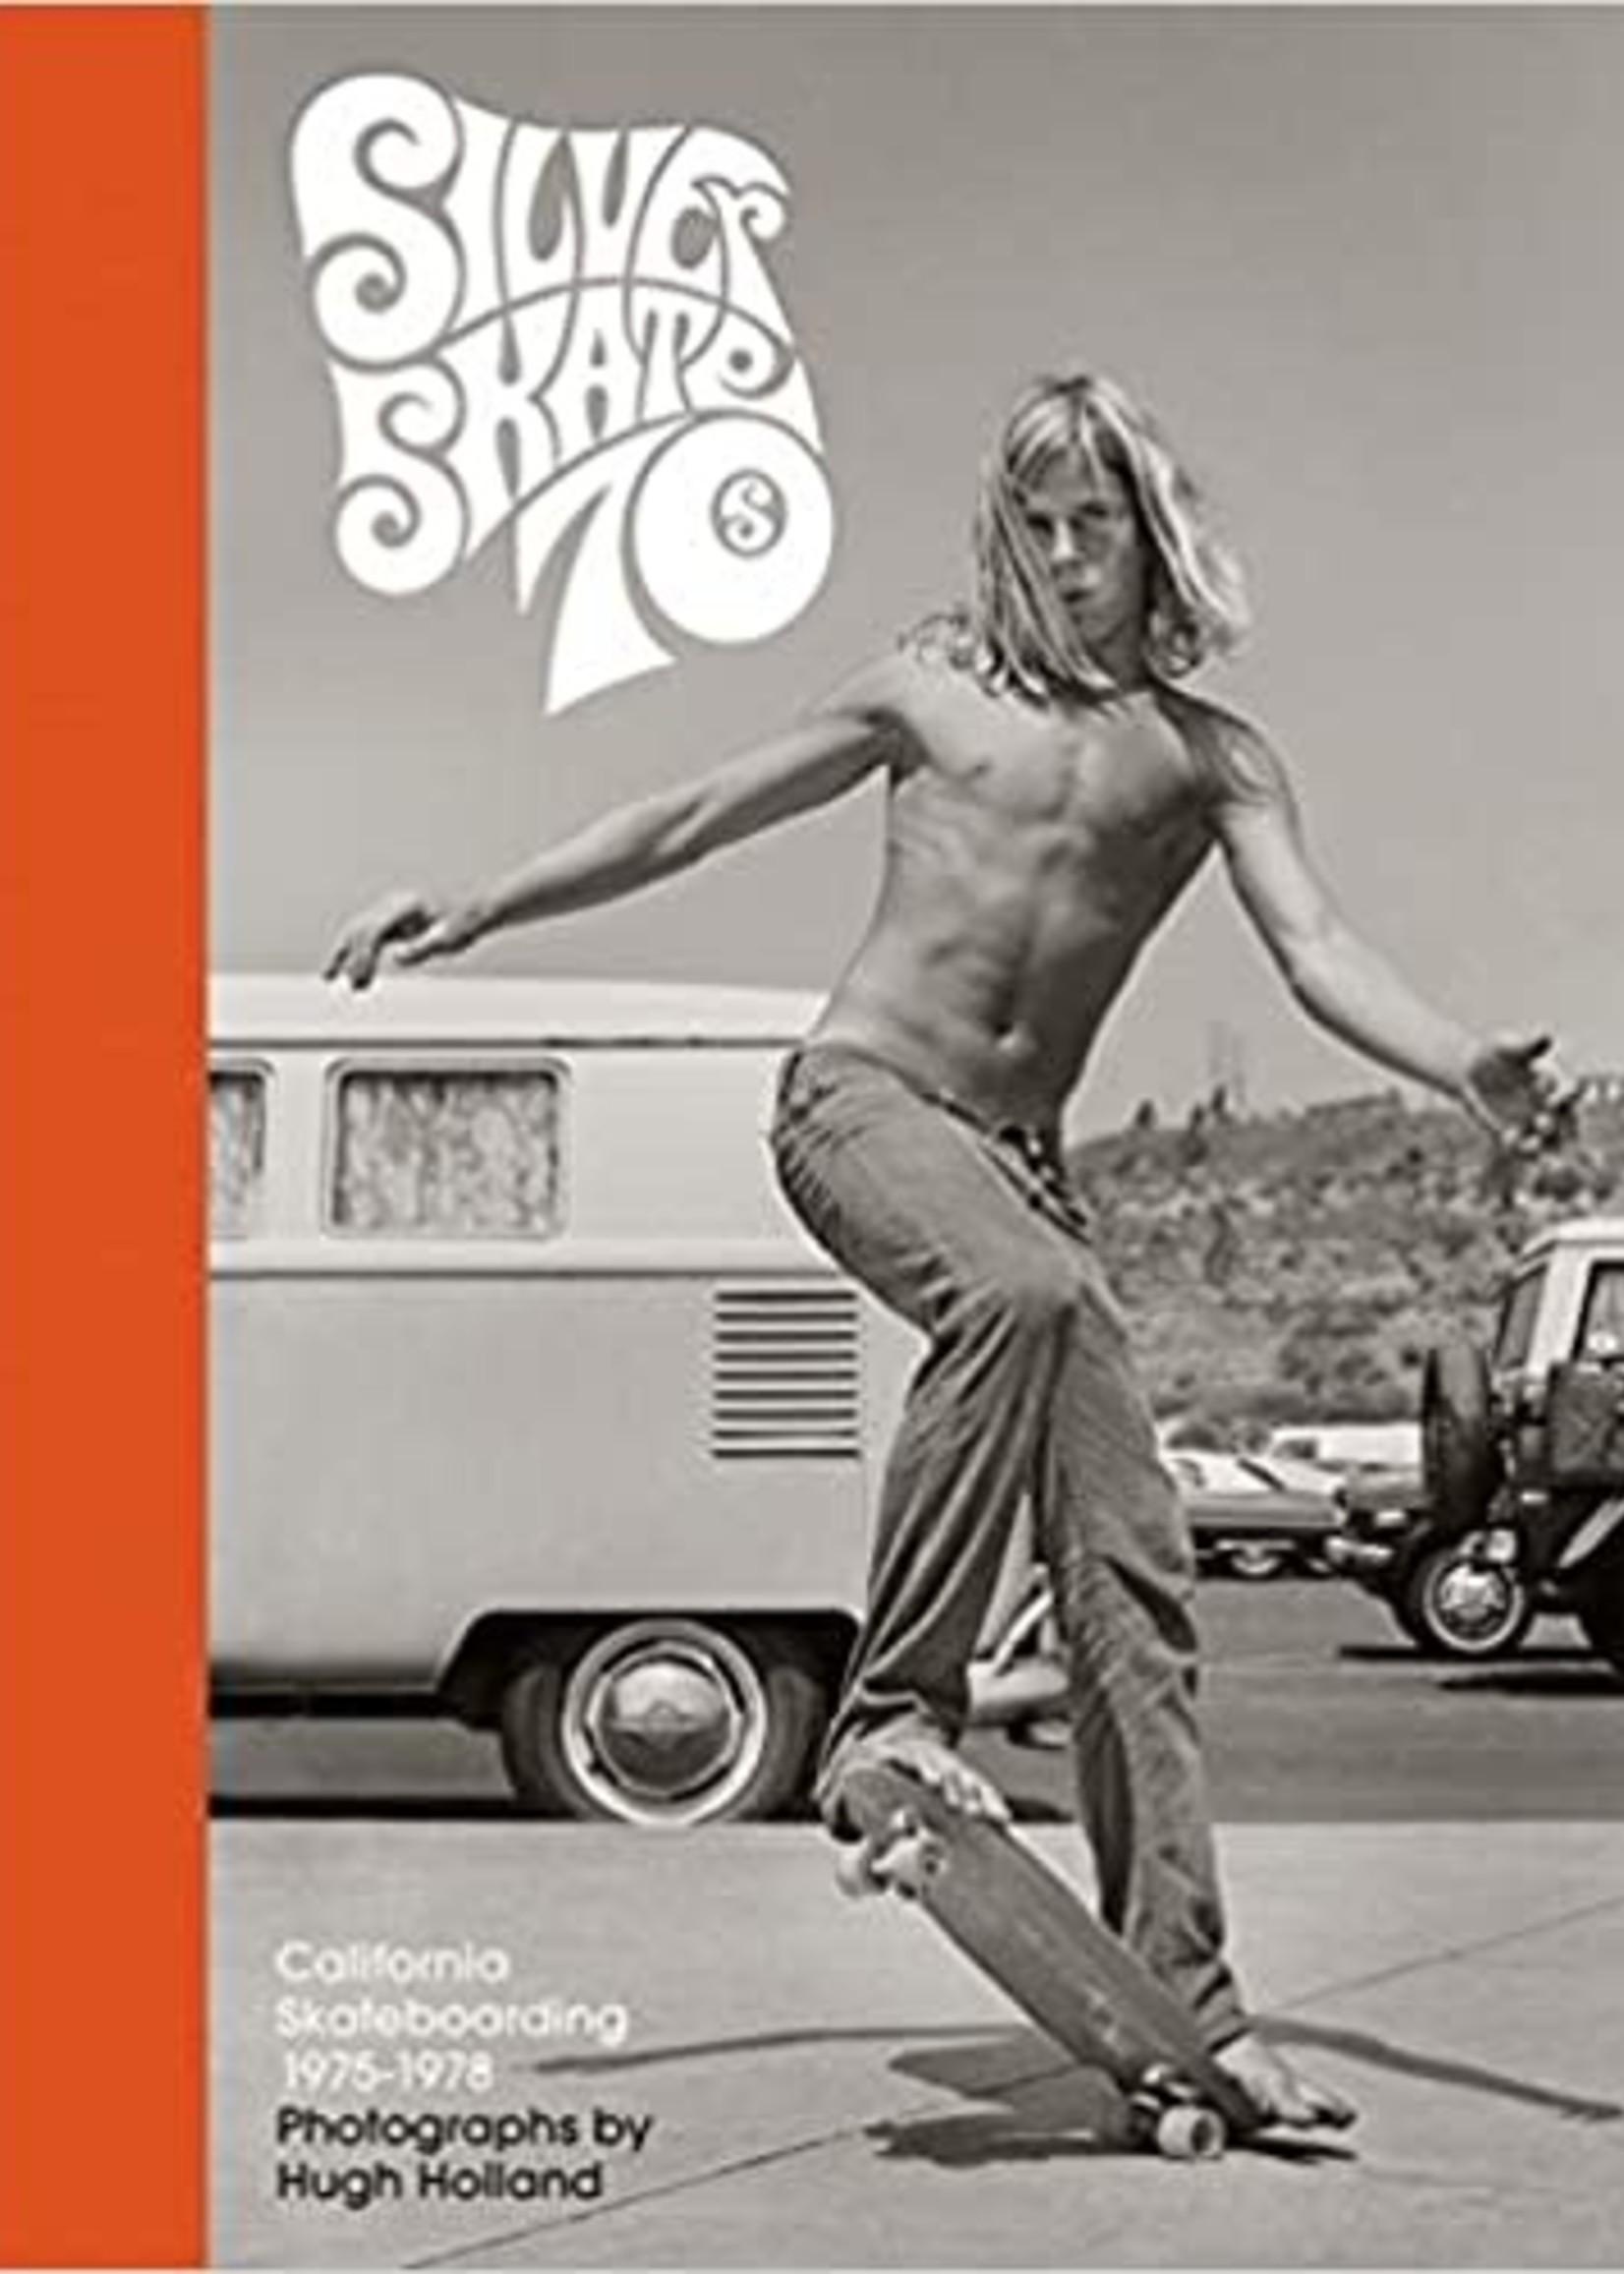 Raincoast Books Silver. Skate. Seventies. Holland